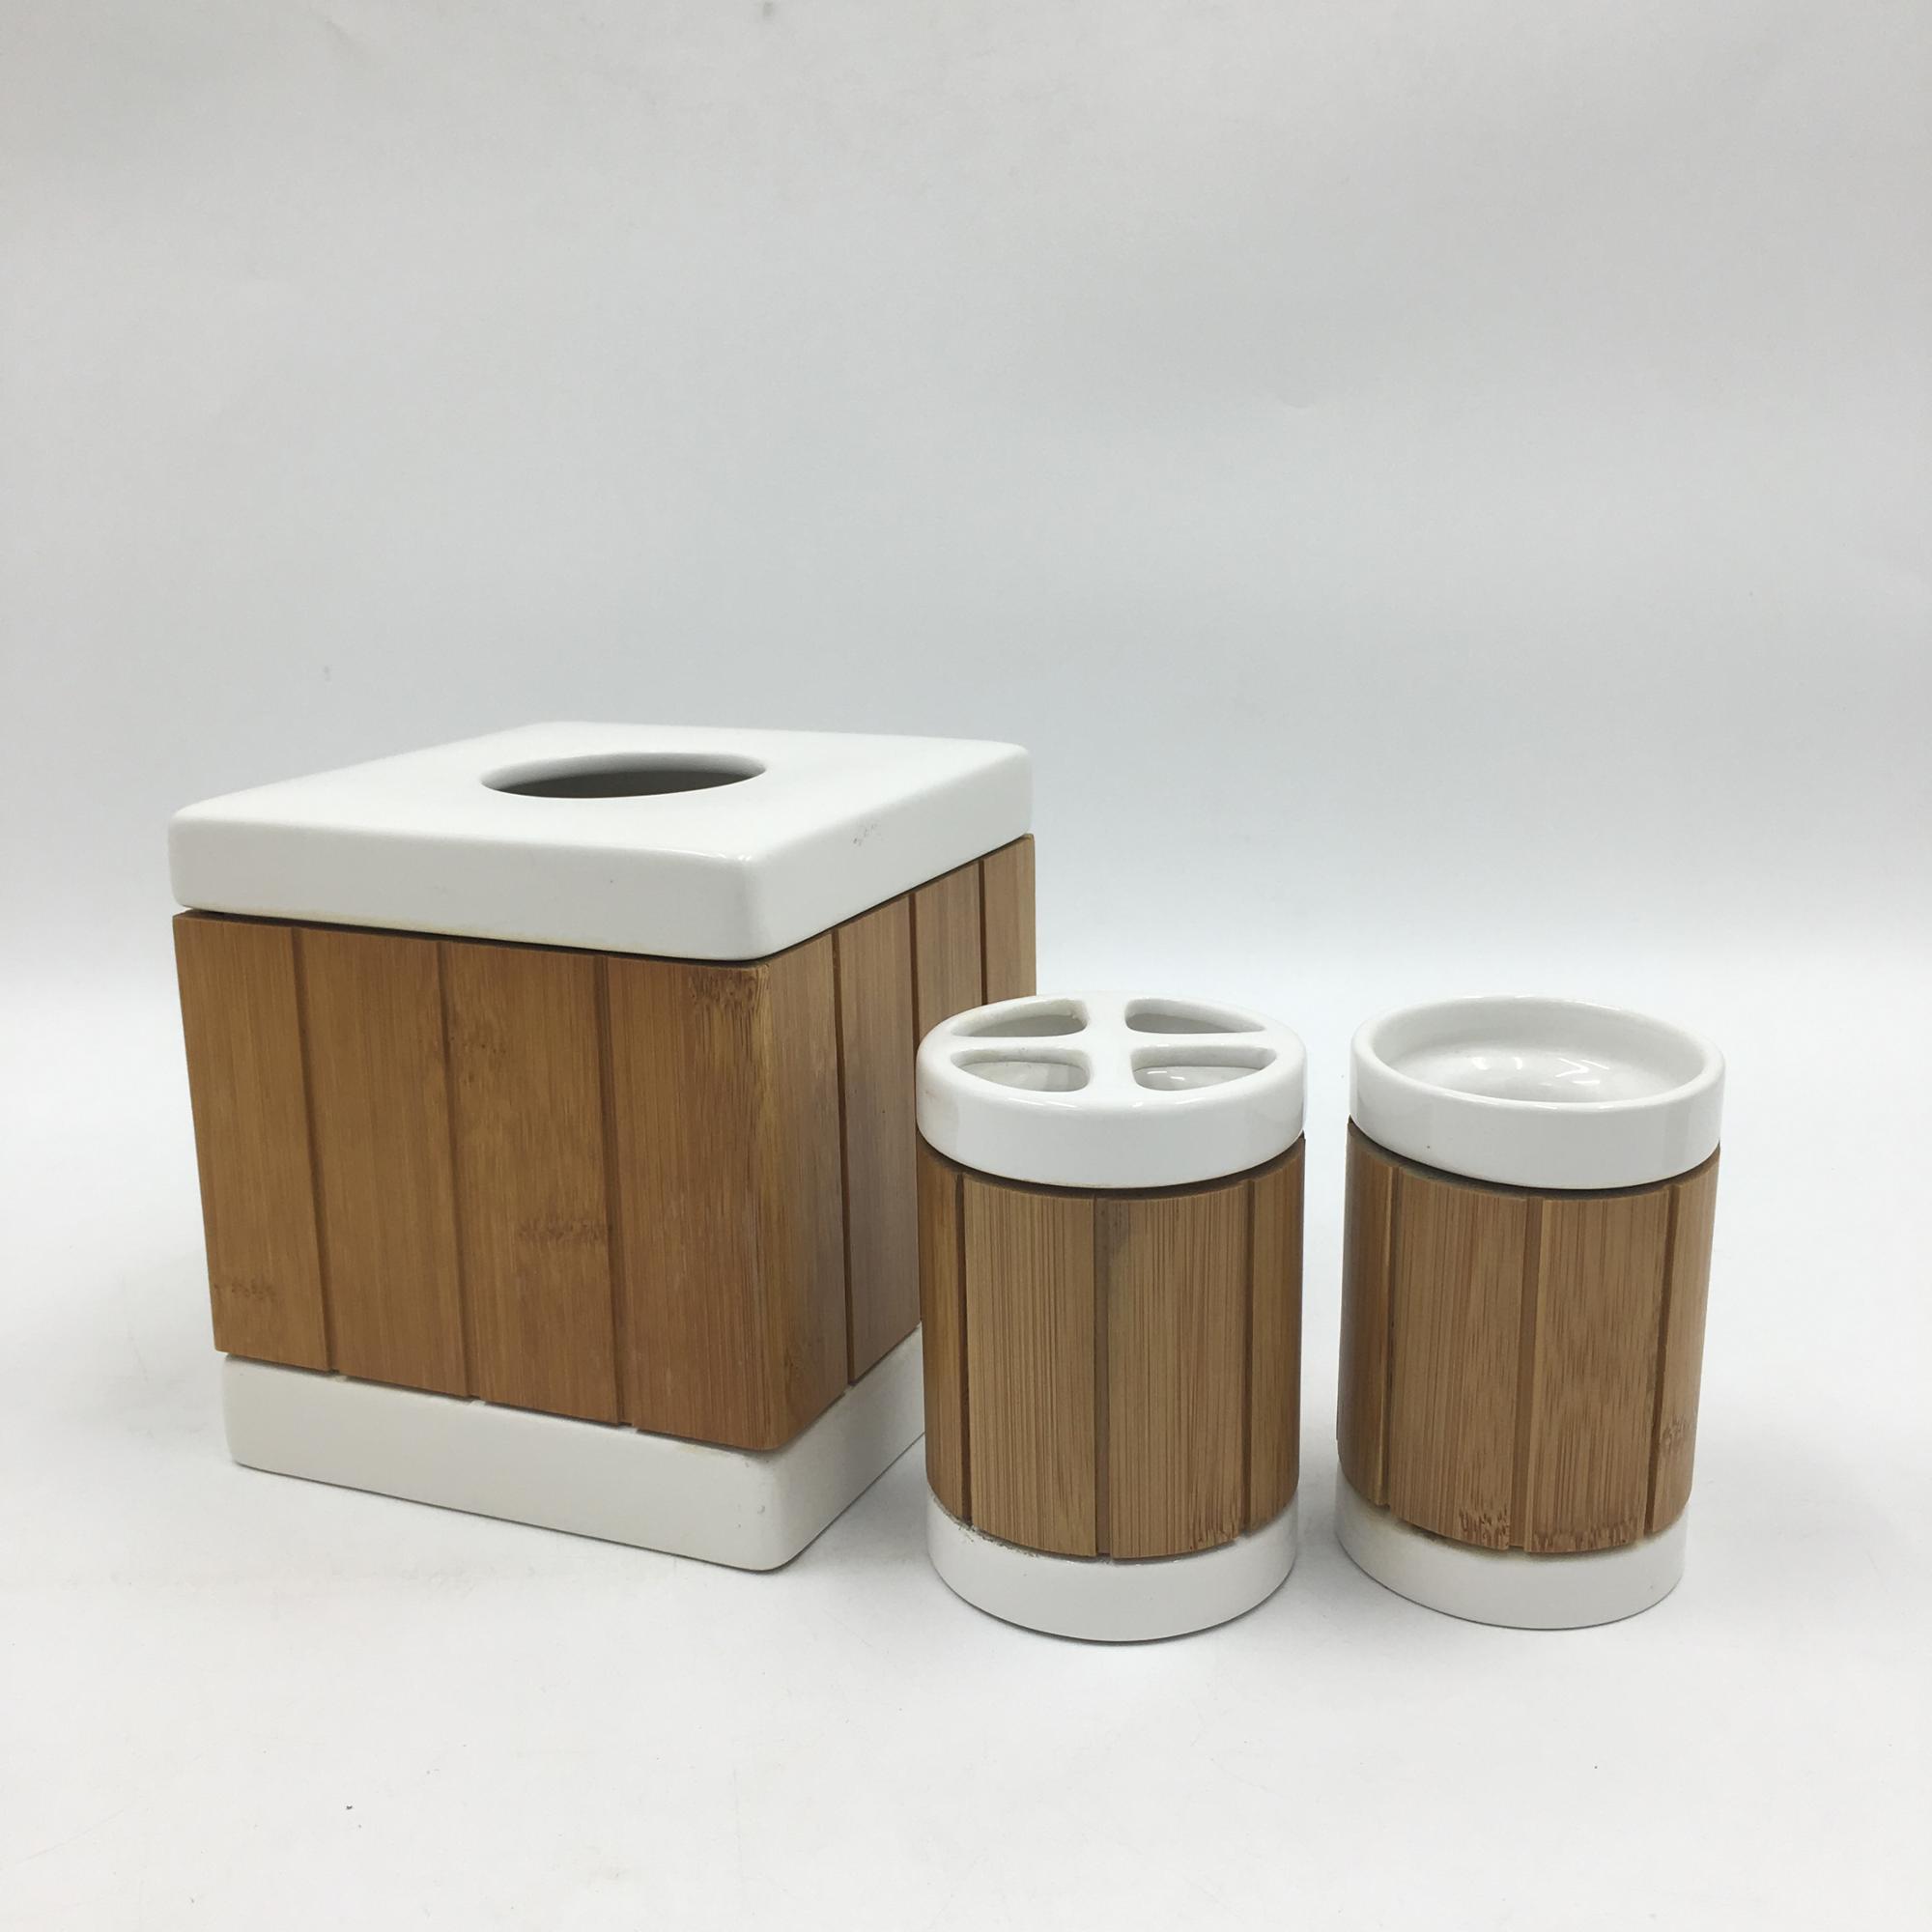 Modern Simple Design White Ceramic Bathroom Sets Wooden Bathroom Accessories Buy Ceramic Bathroom Sets Bathroom Accessories Set Wooden Bathroom Accessories Product On Alibaba Com